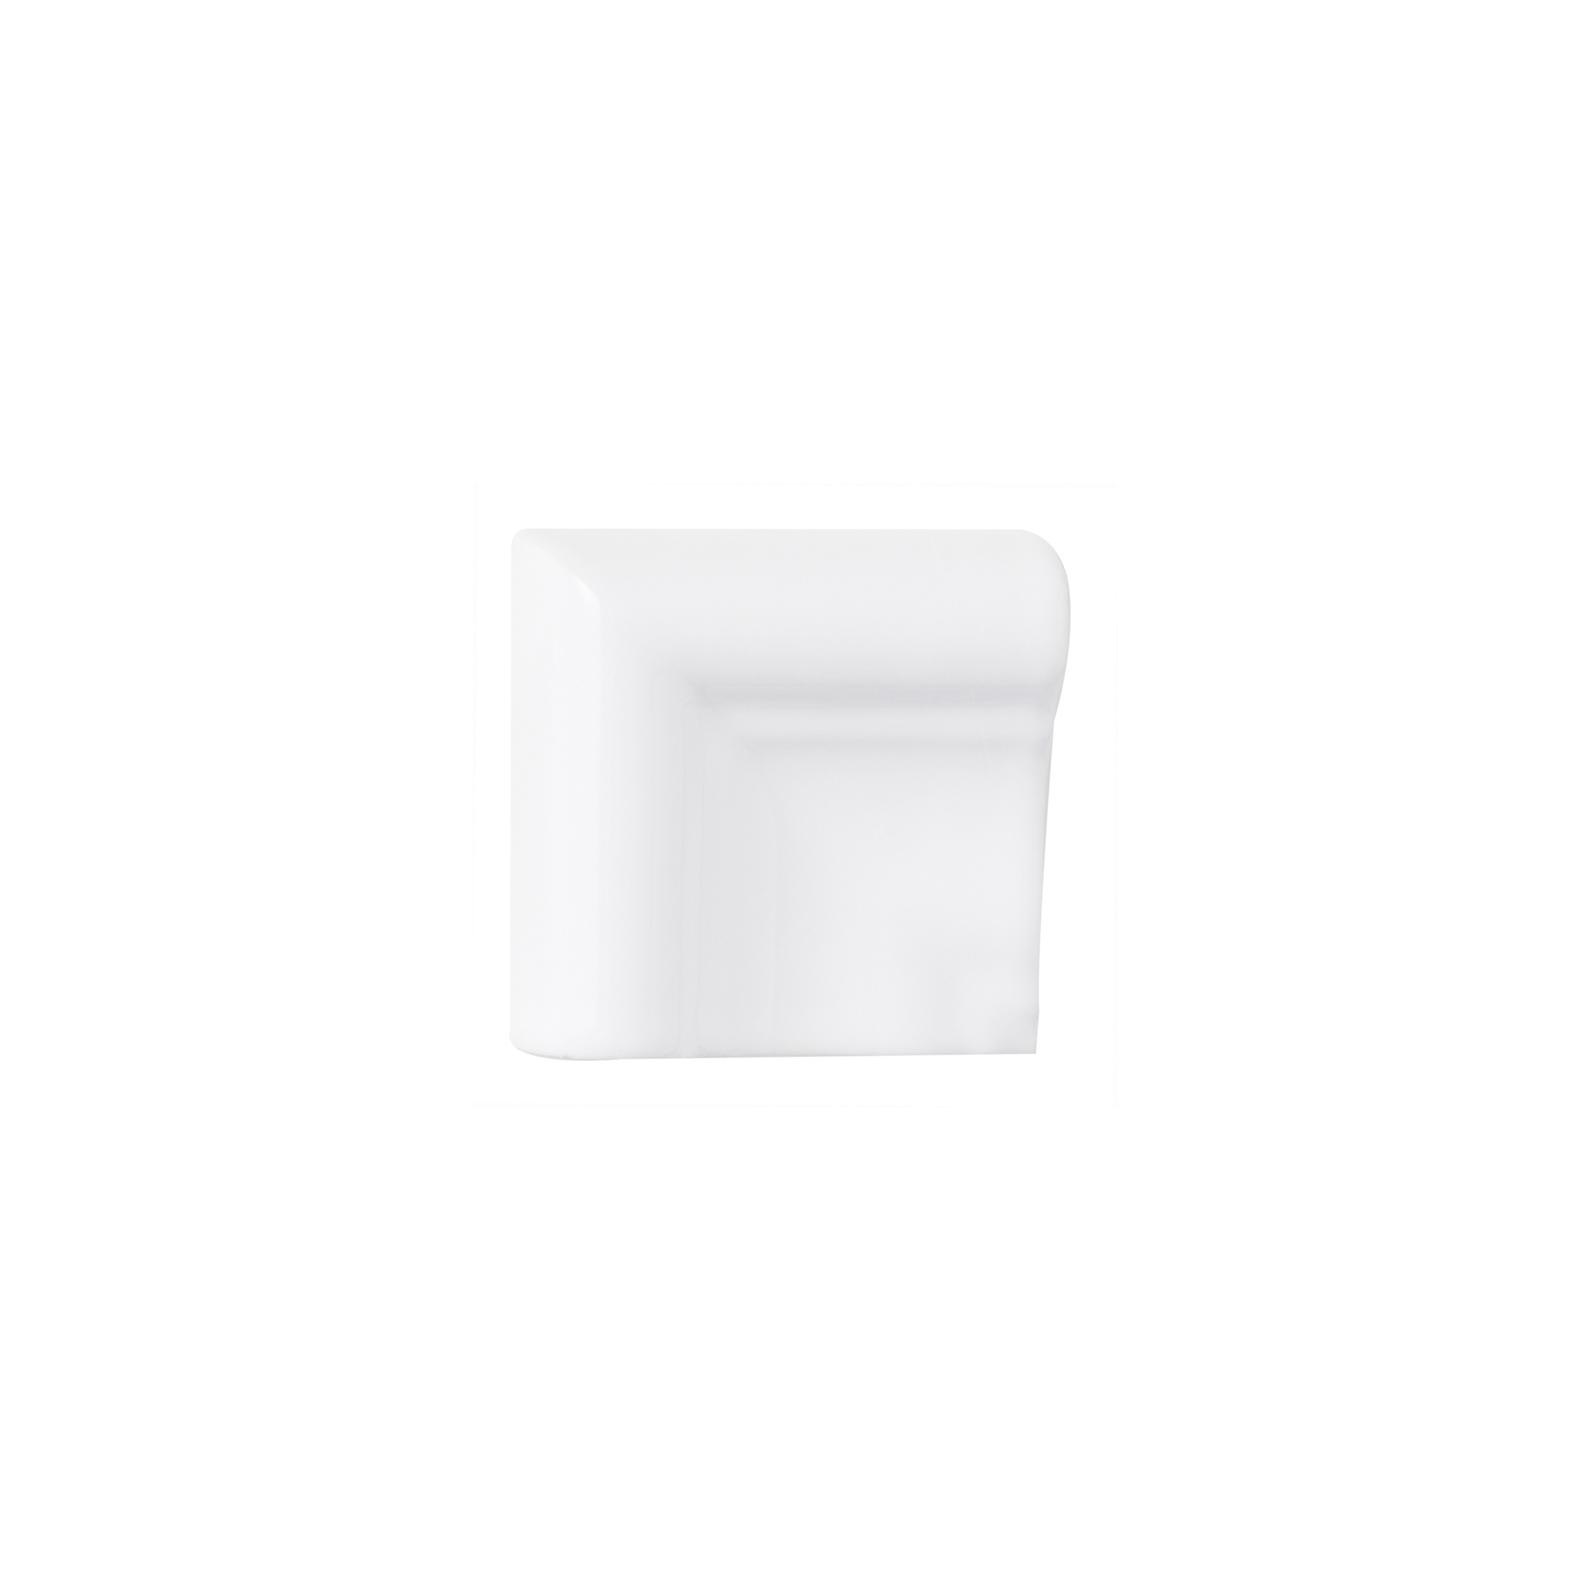 ADST5164 - ANGULO MARCO CORNISA - 7.5 cm X 19.8 cm